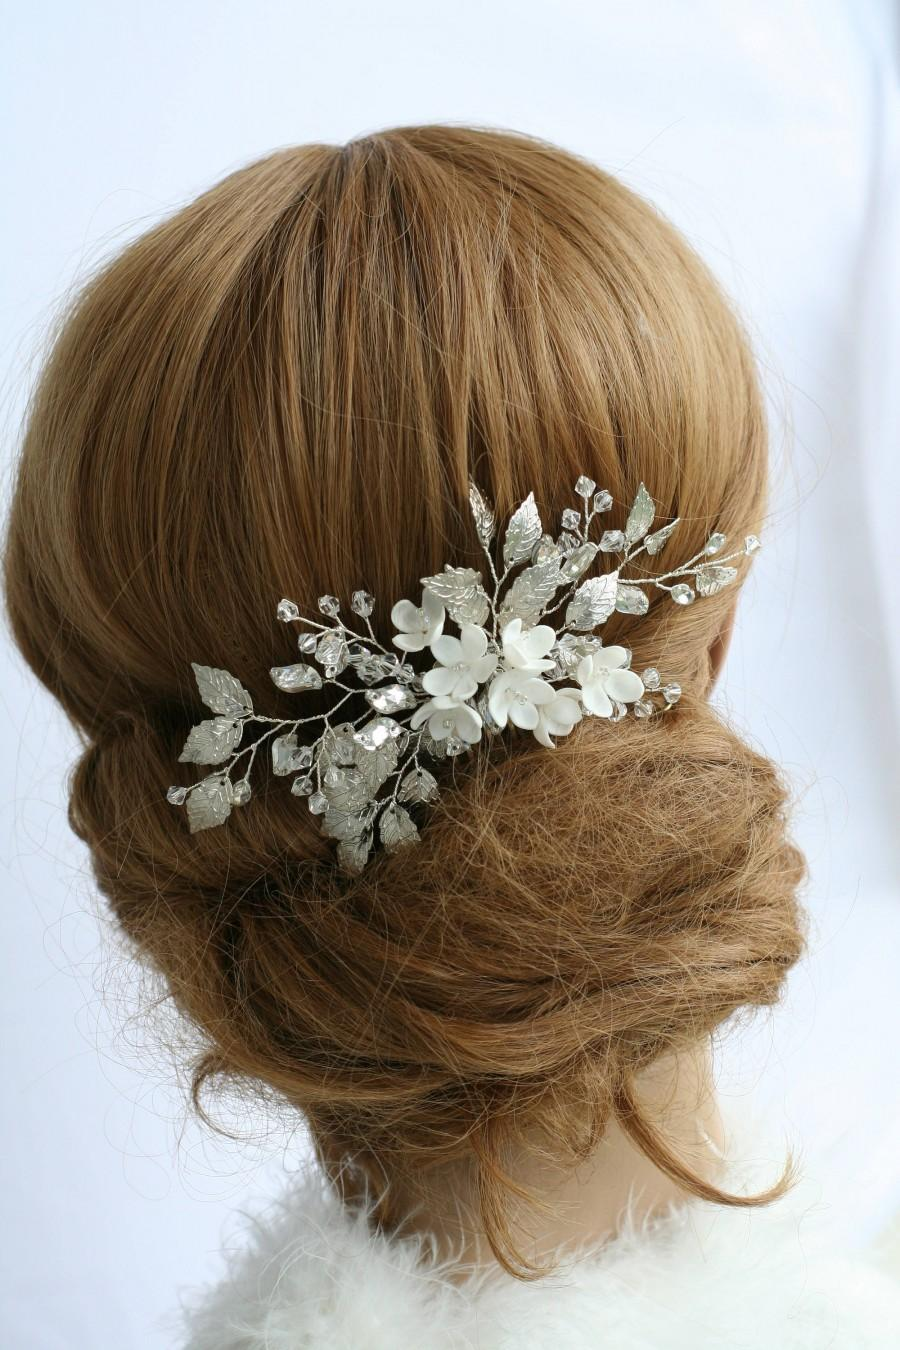 Wedding - Bridal hair comb Silver Bridal Hair comb Wedding hair comb Flower bridal comb Bridal hair accessories Silver Wedding accessories Silver